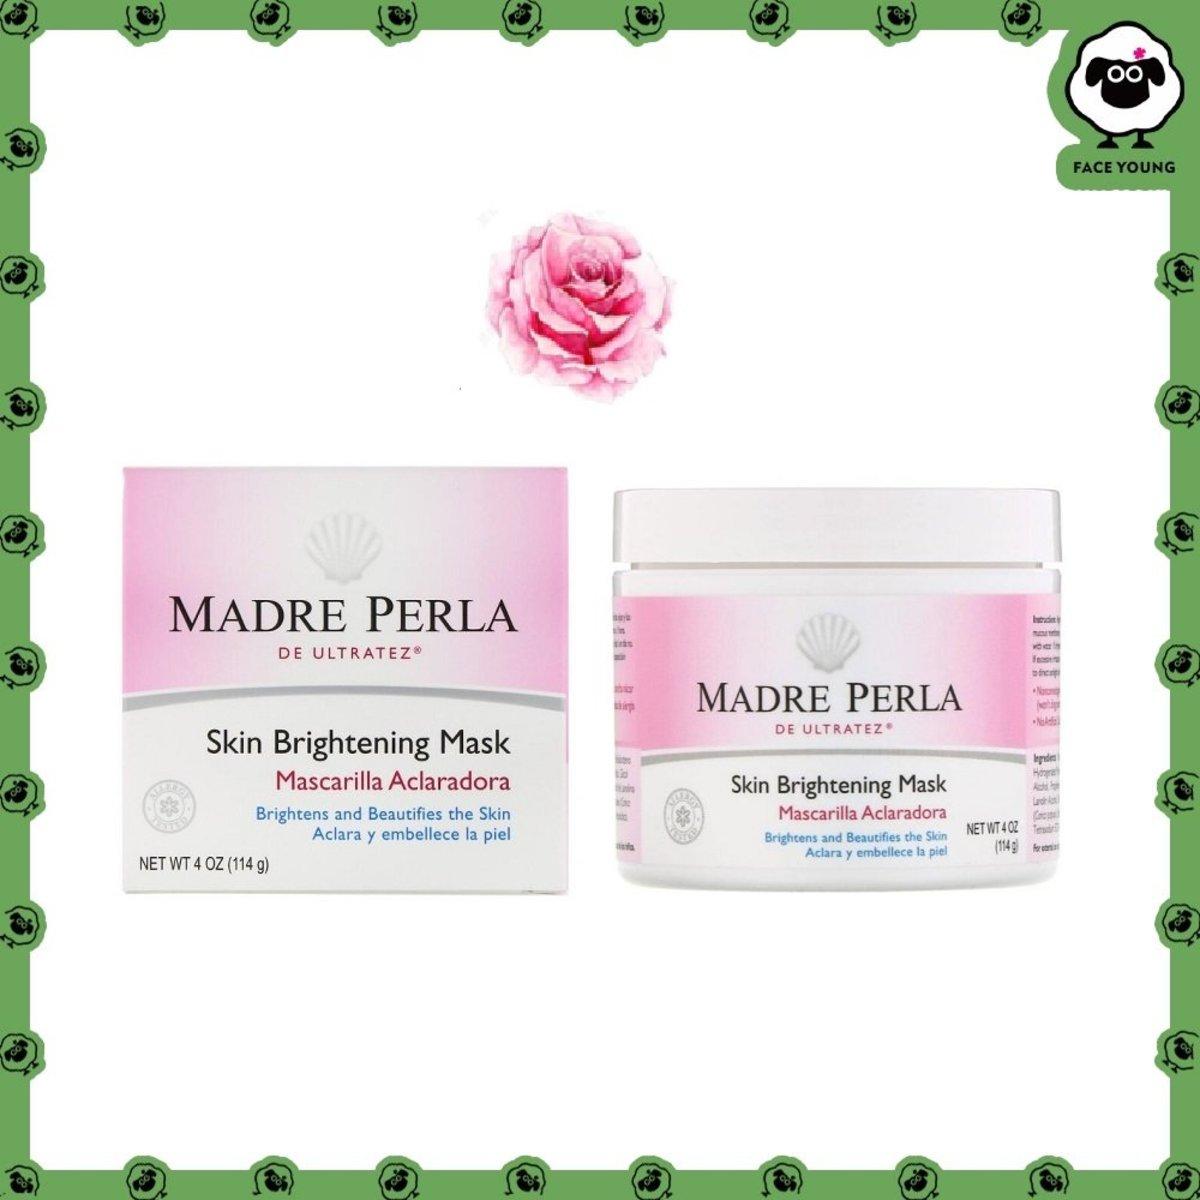 Madre Perla, Skin Brightening Mask, 4 oz (114 g)